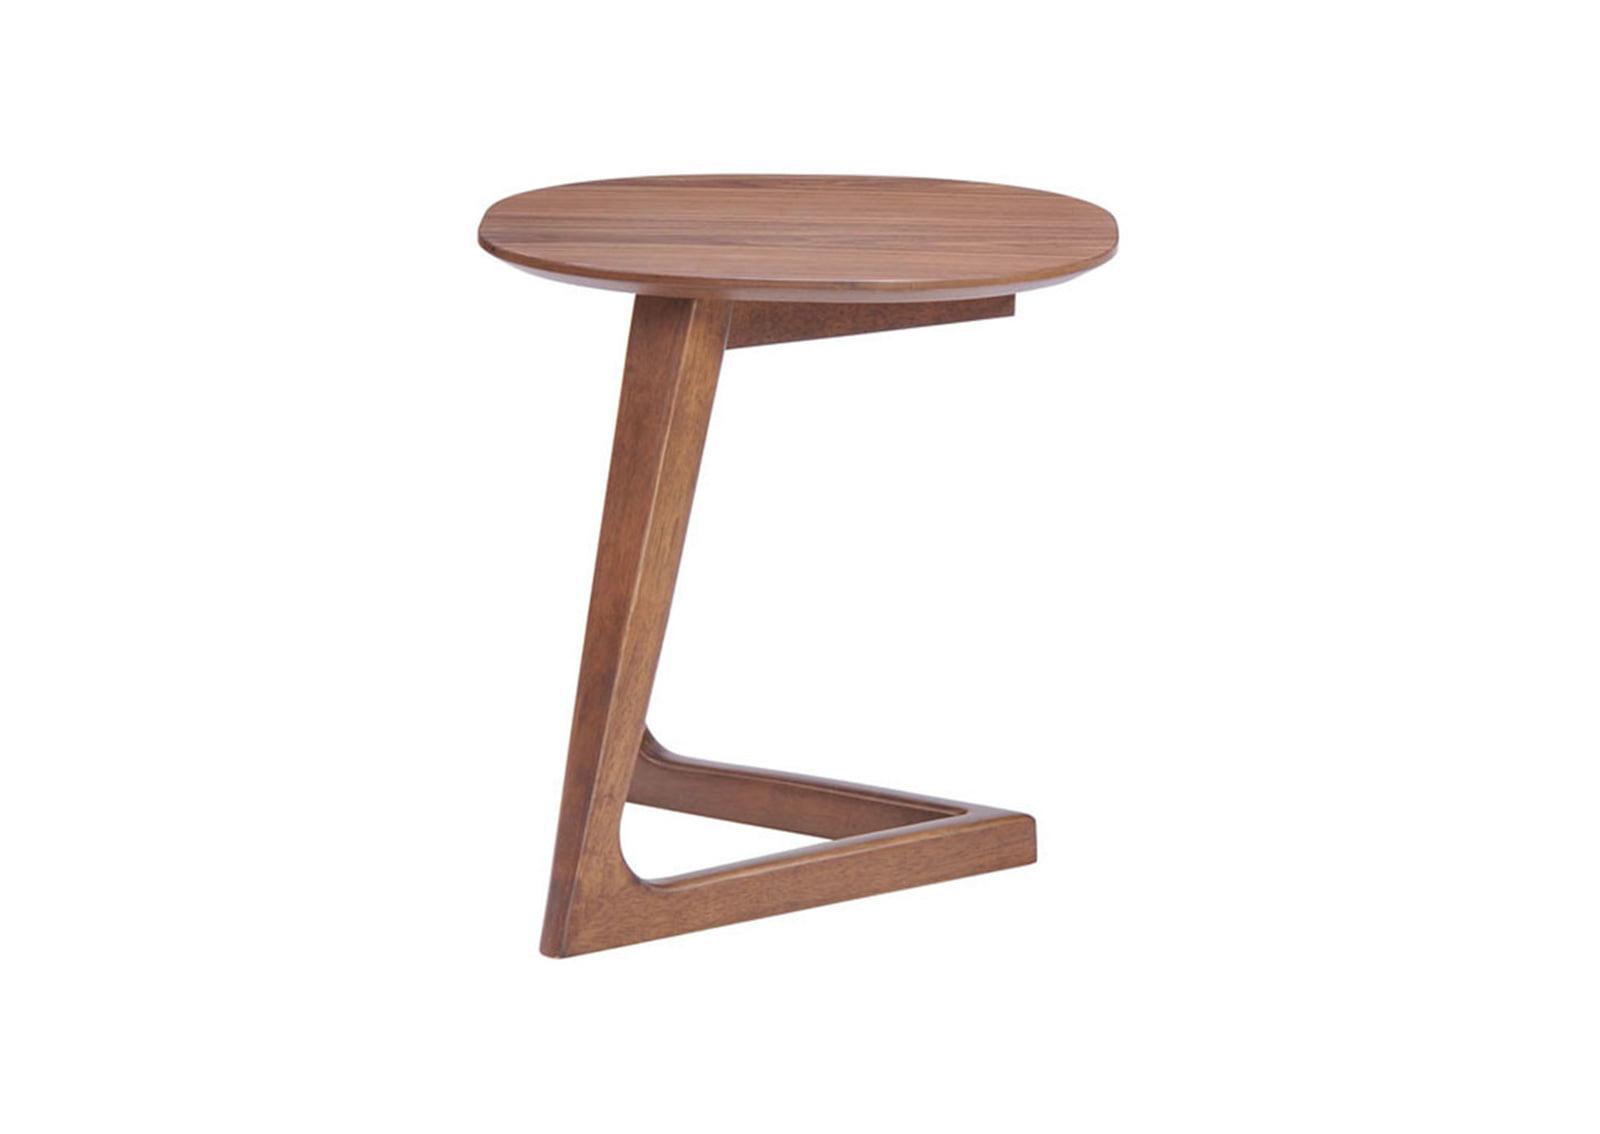 Park west side table walnut furnishplus for Walnut side table